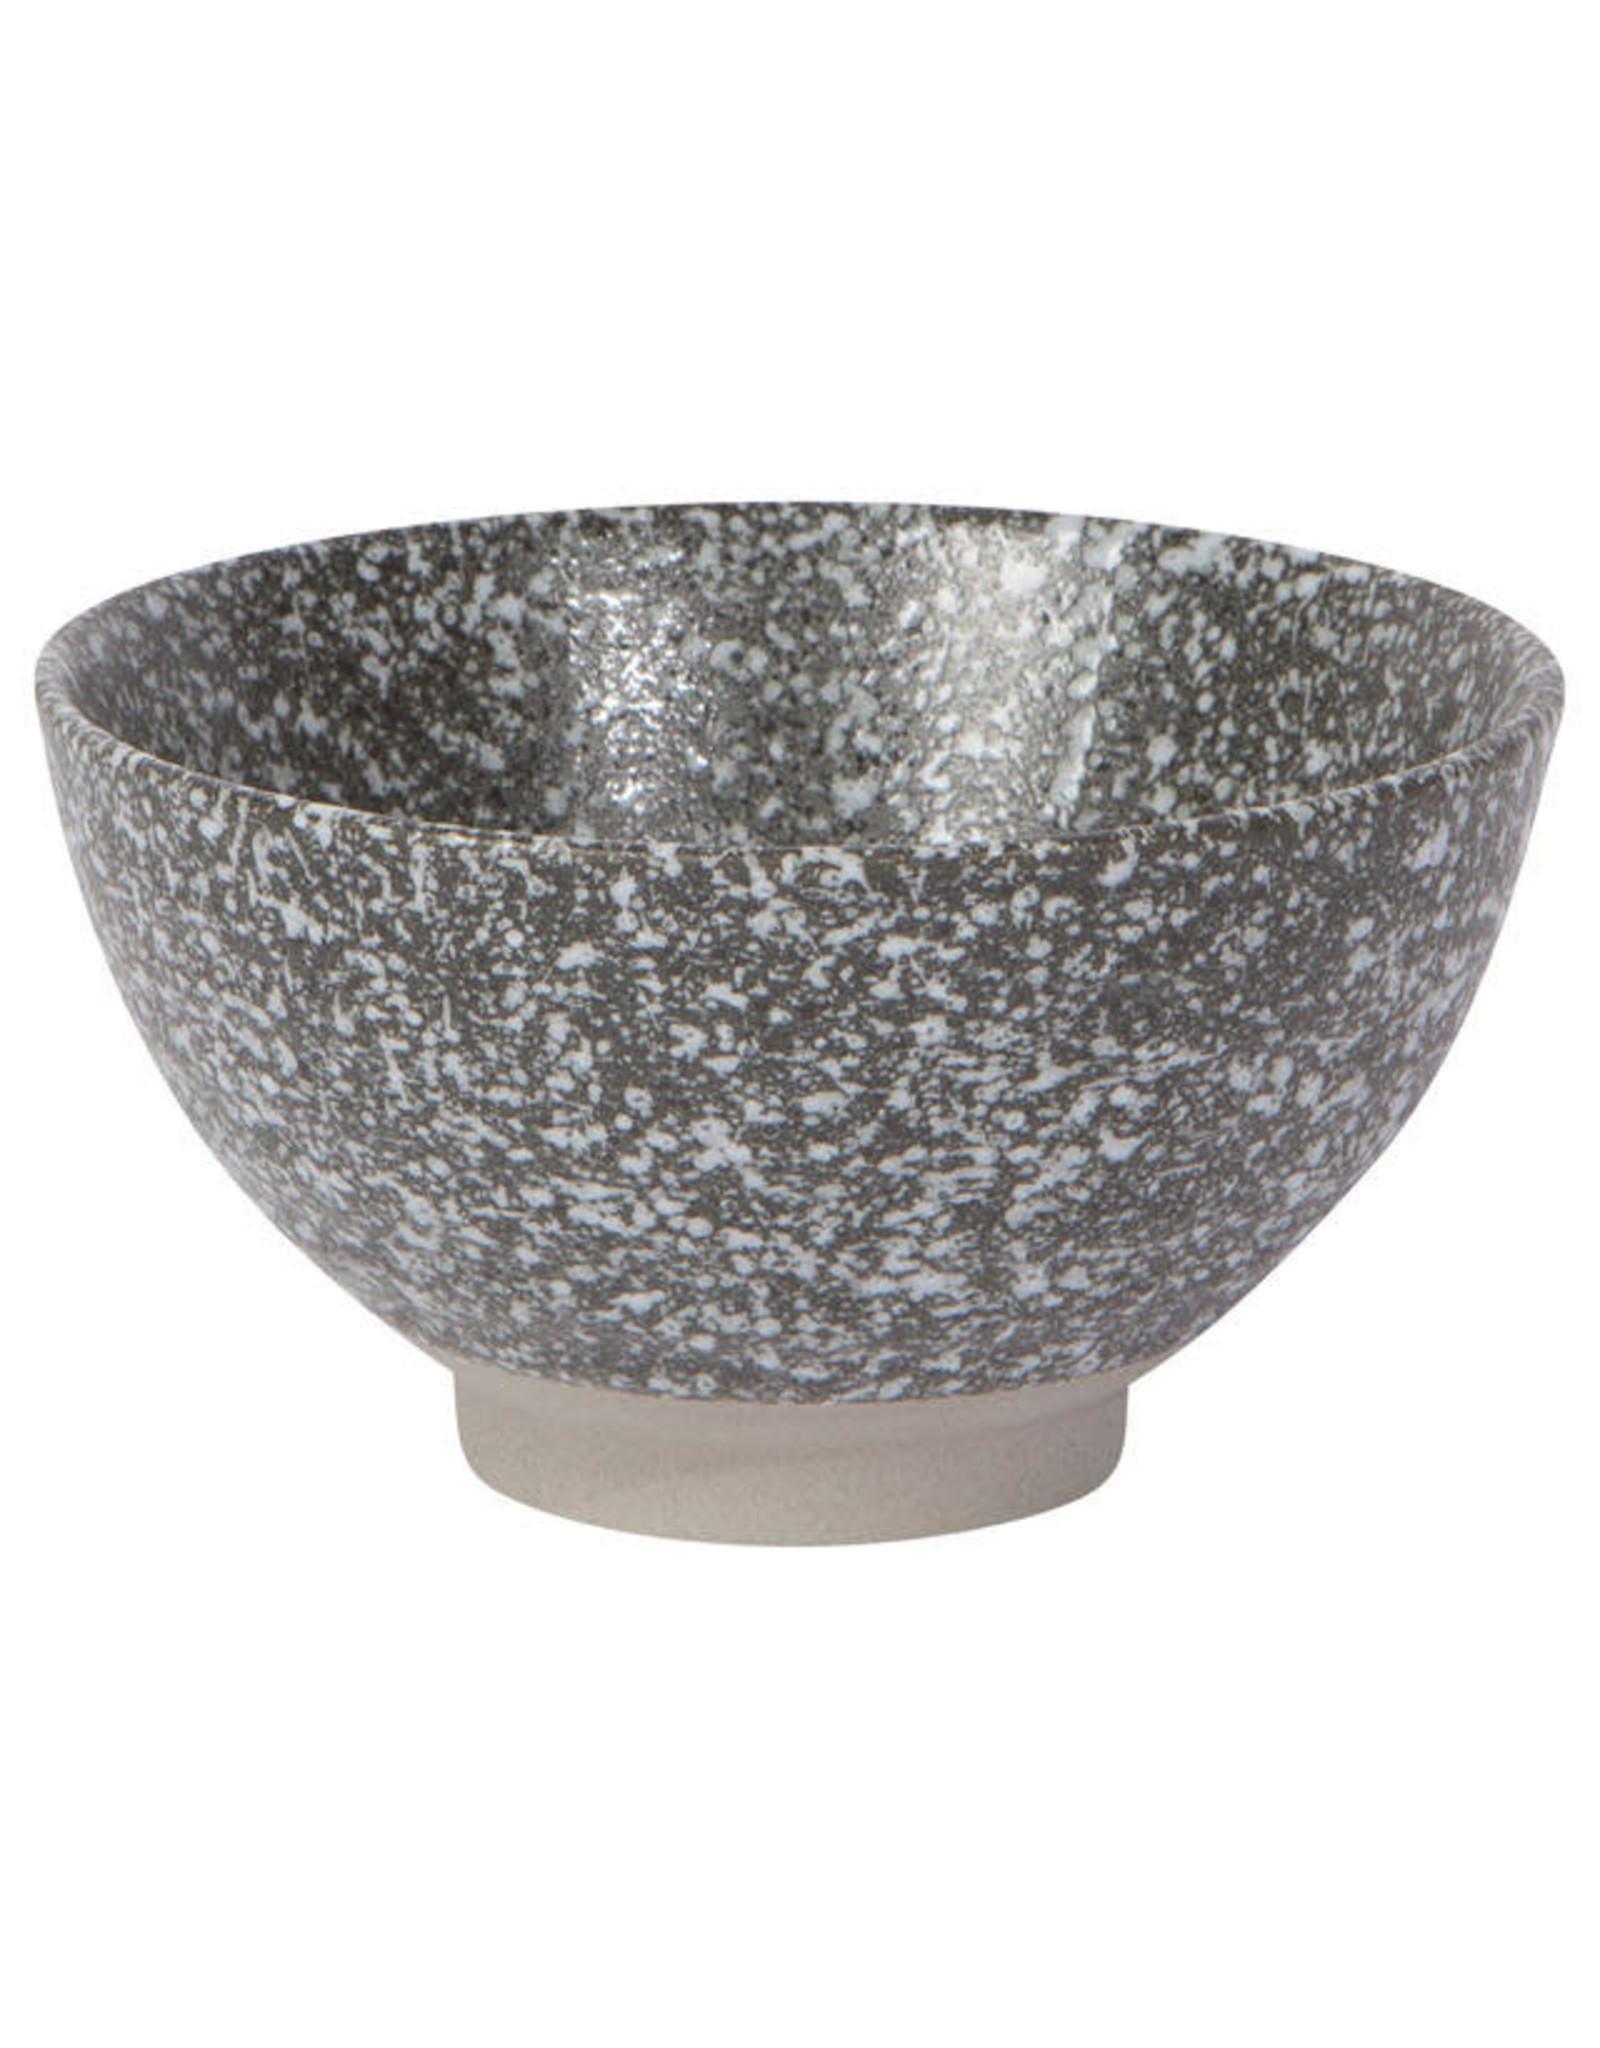 Element Bowl - Avani